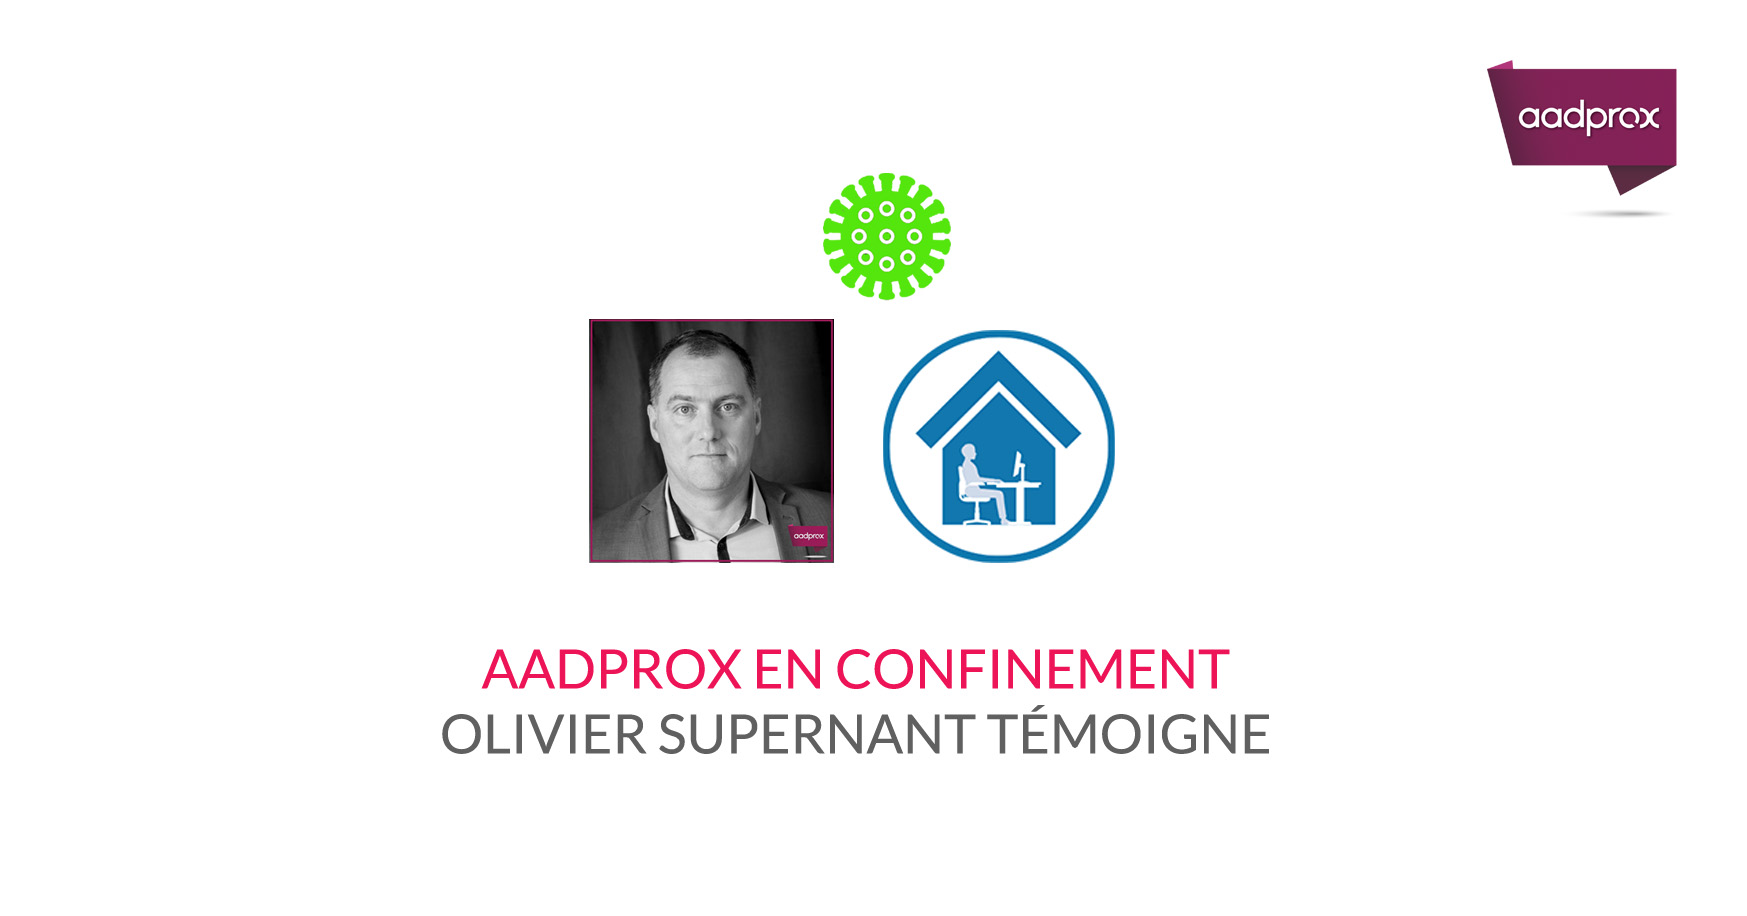 Olivier Supernant le quotidien d'un Aadprox en confinement